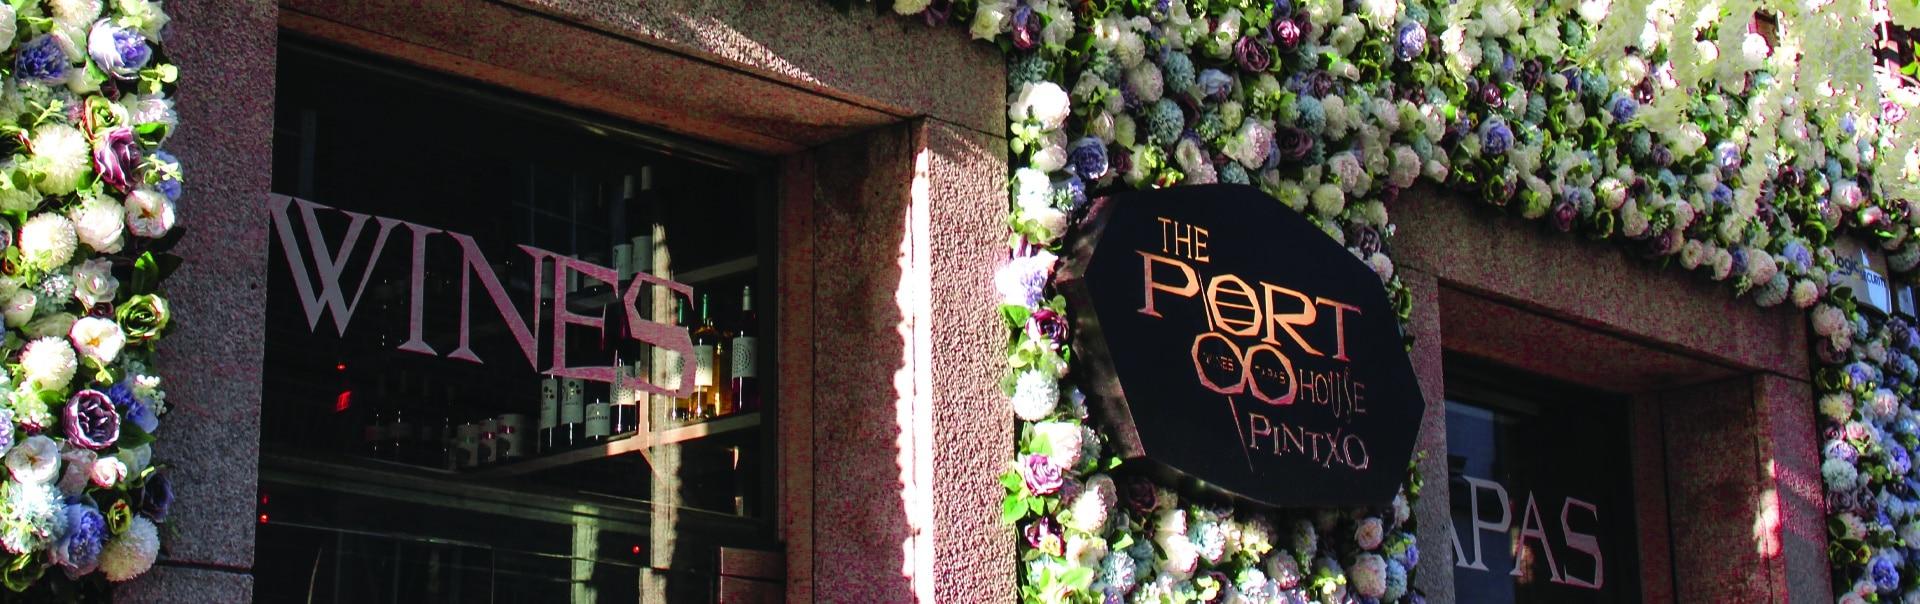 The Port House Restaurant | Storefront Sign